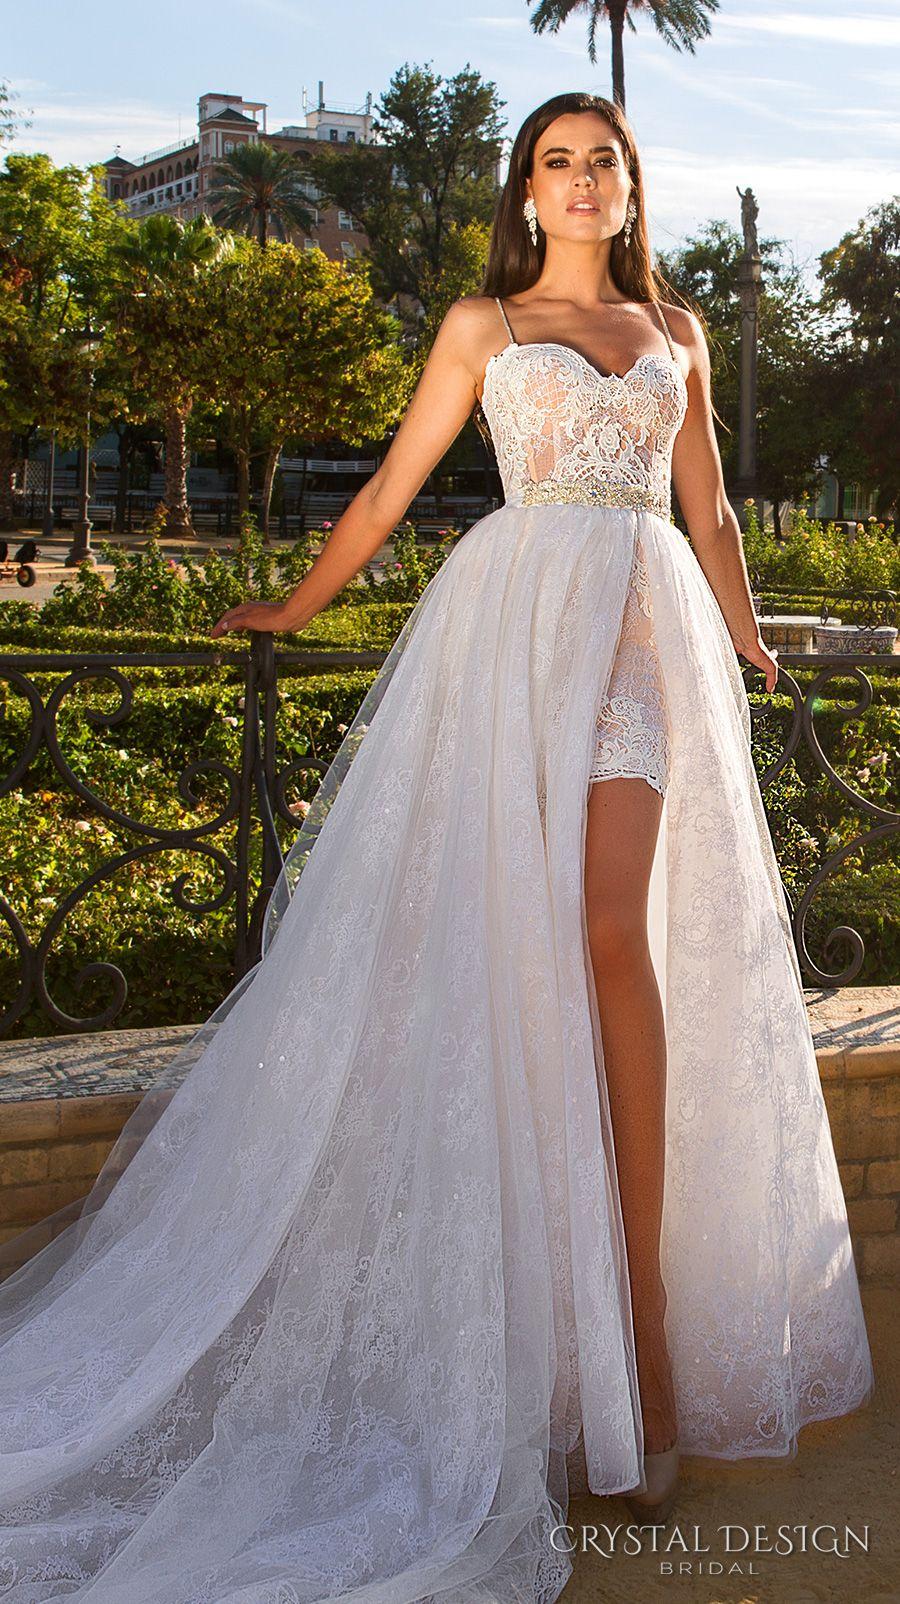 ac2c04886506 Crystal Design 2017 bridal spagetti strap sweetheart neckline full  embellishment lace mini skirt above knee short wedding dress a line  overskirt long train ...